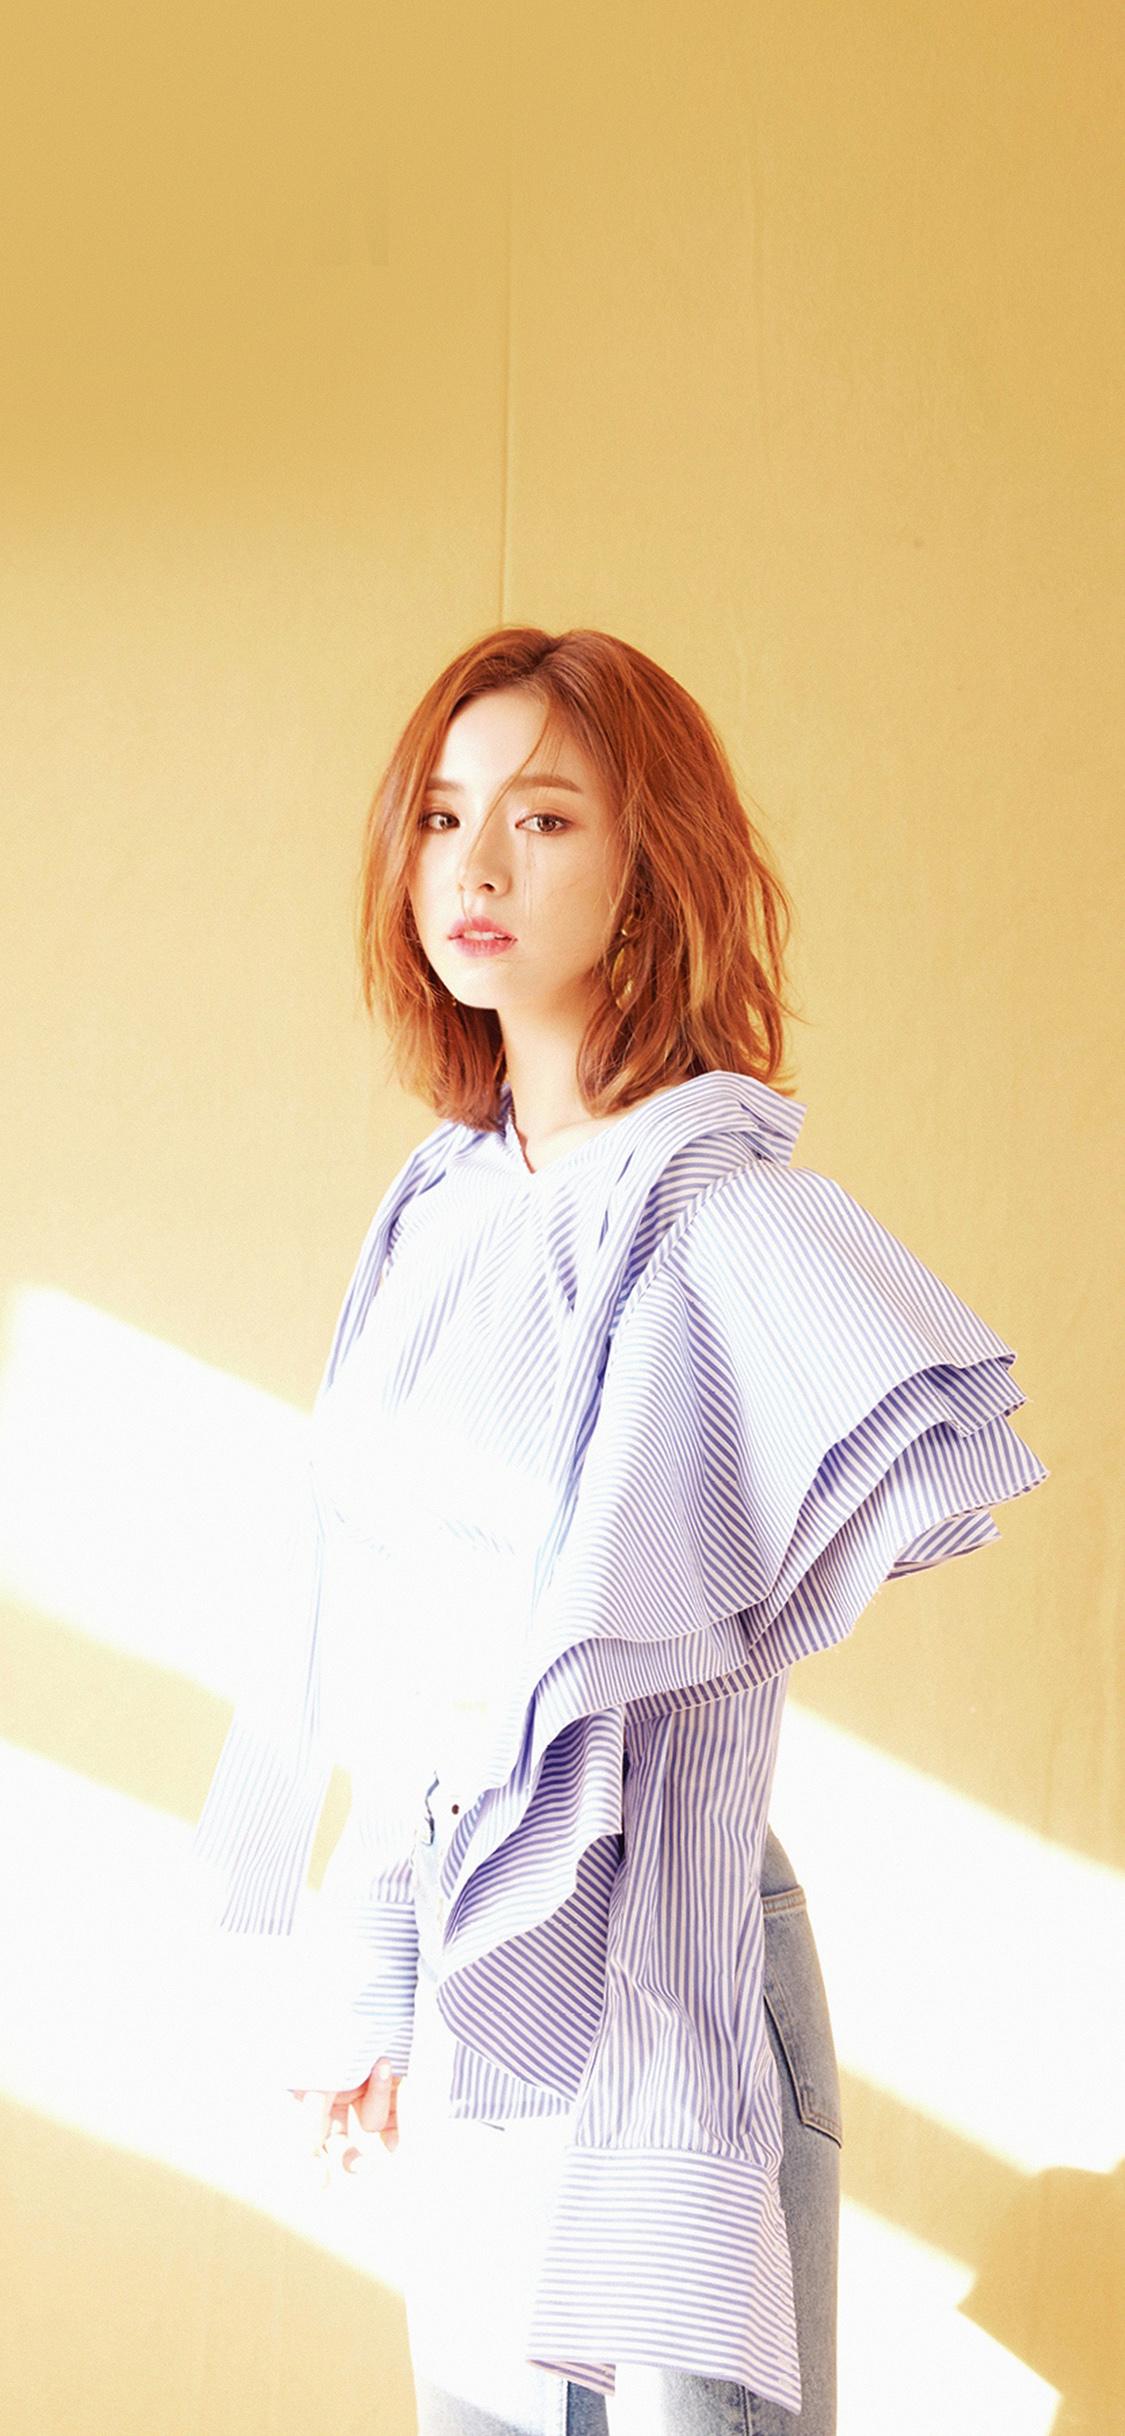 Korean Cute Girl Hd Wallpaper Ho19 Girl Korean Asian Cute Wallpaper